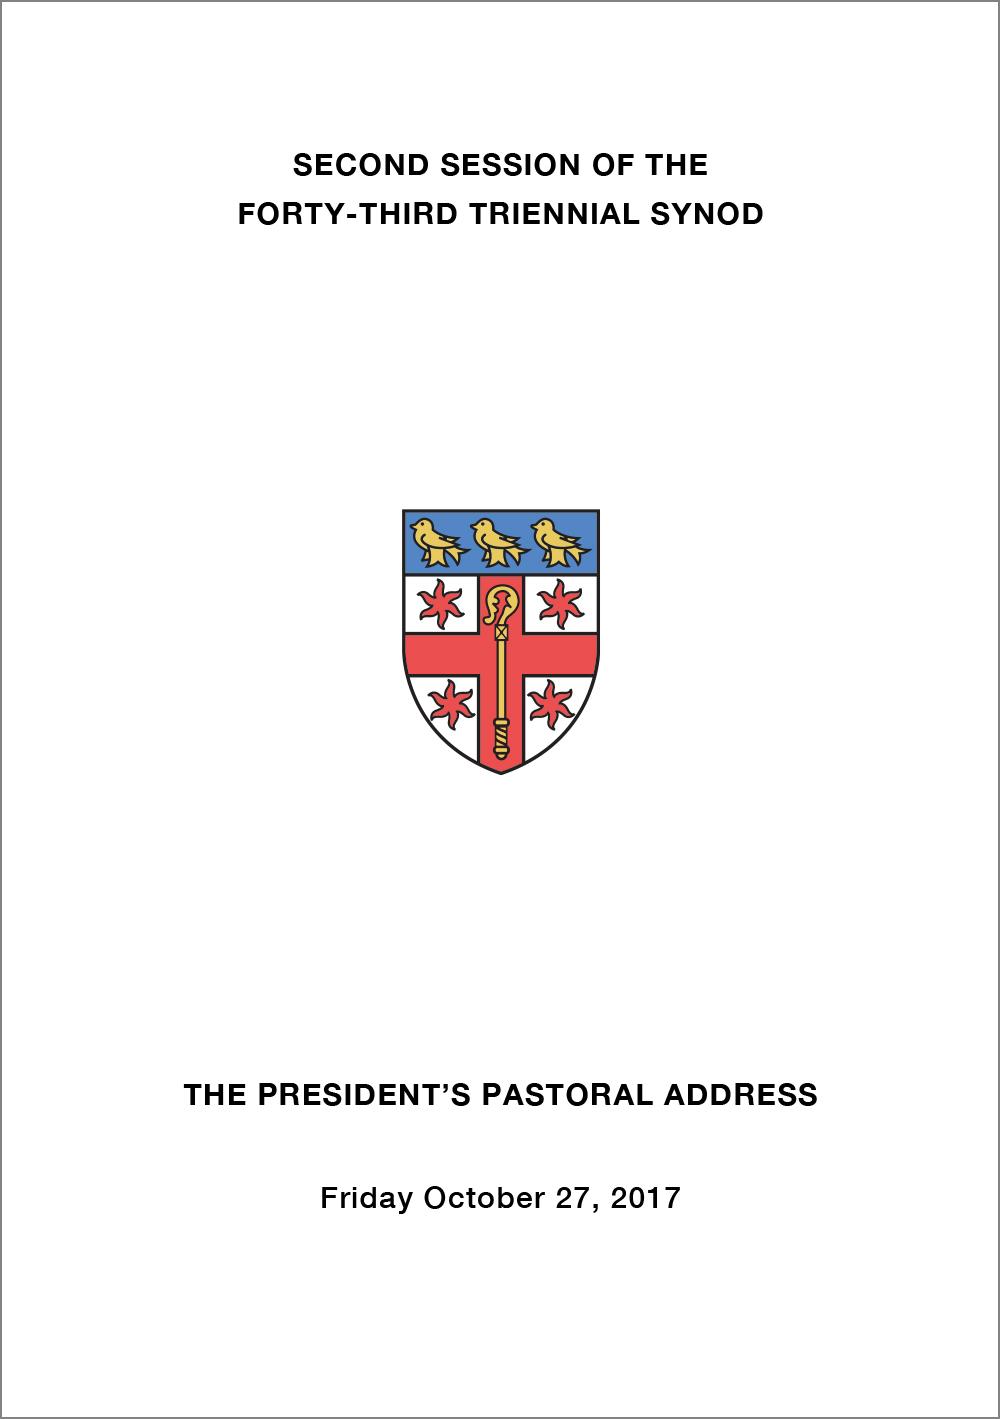 Download  the 2017 Archbishop's Pastoral Address [PDF 169KB]